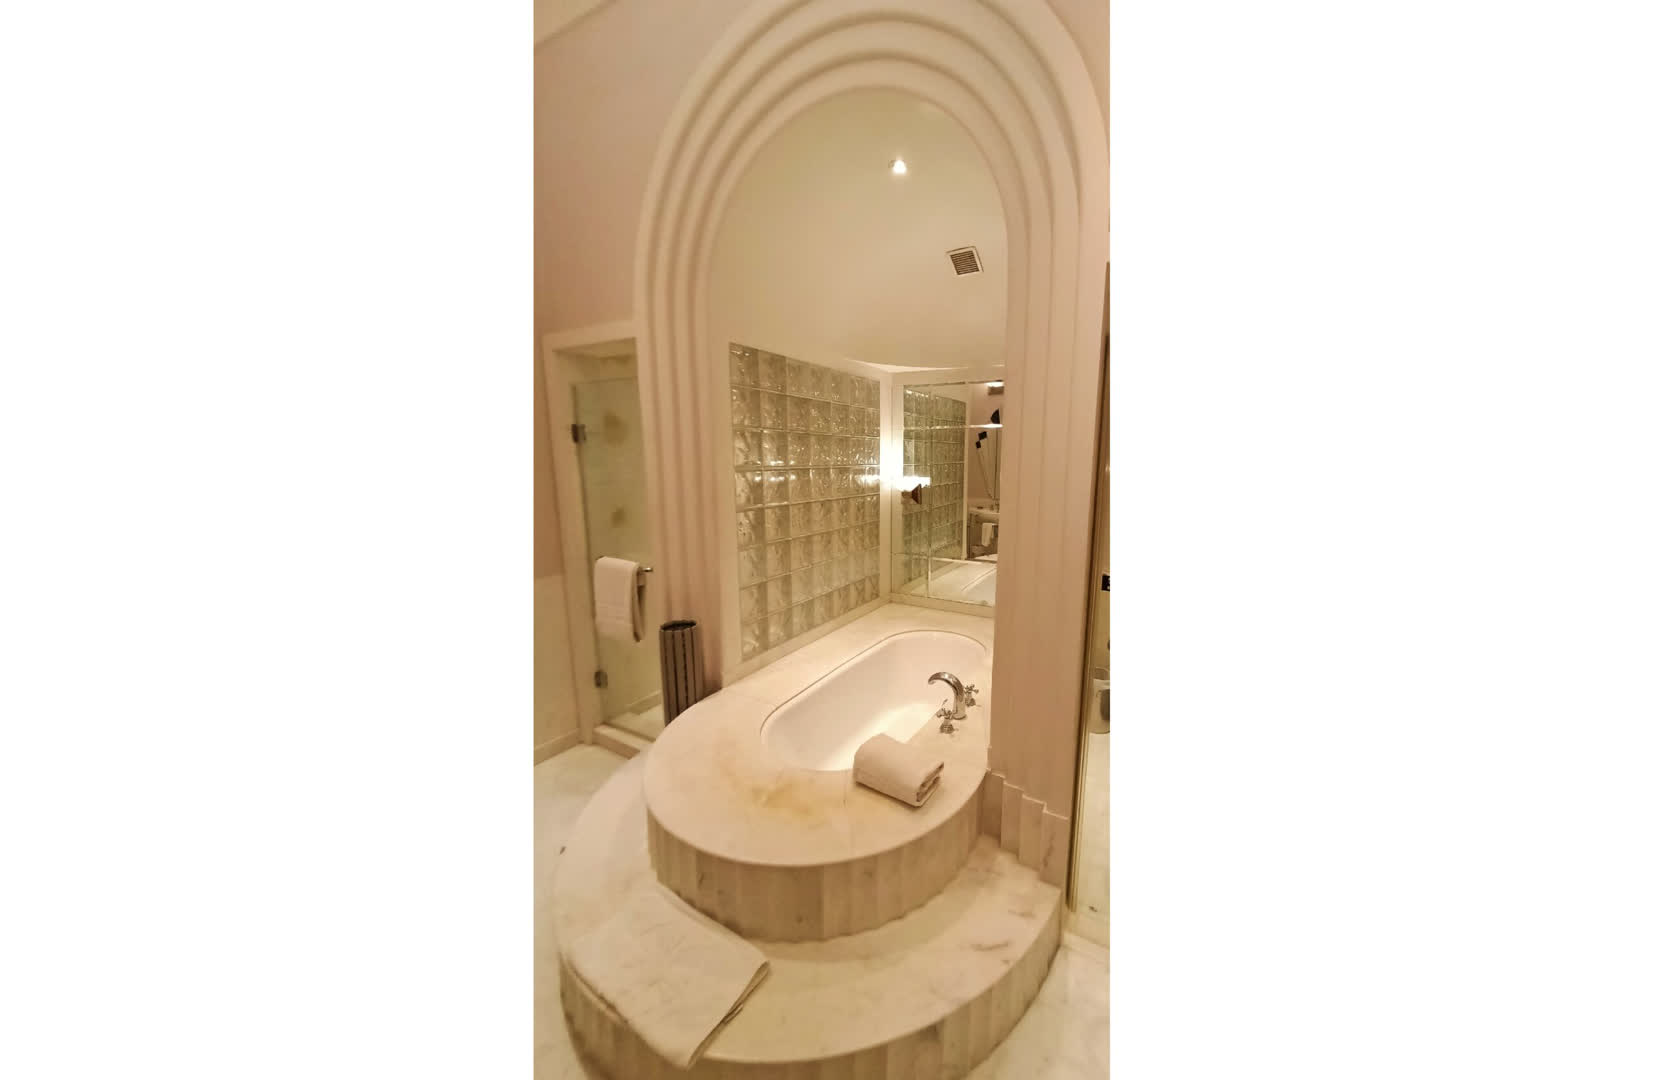 Gayatri Devi's step-in bathtub made of marble